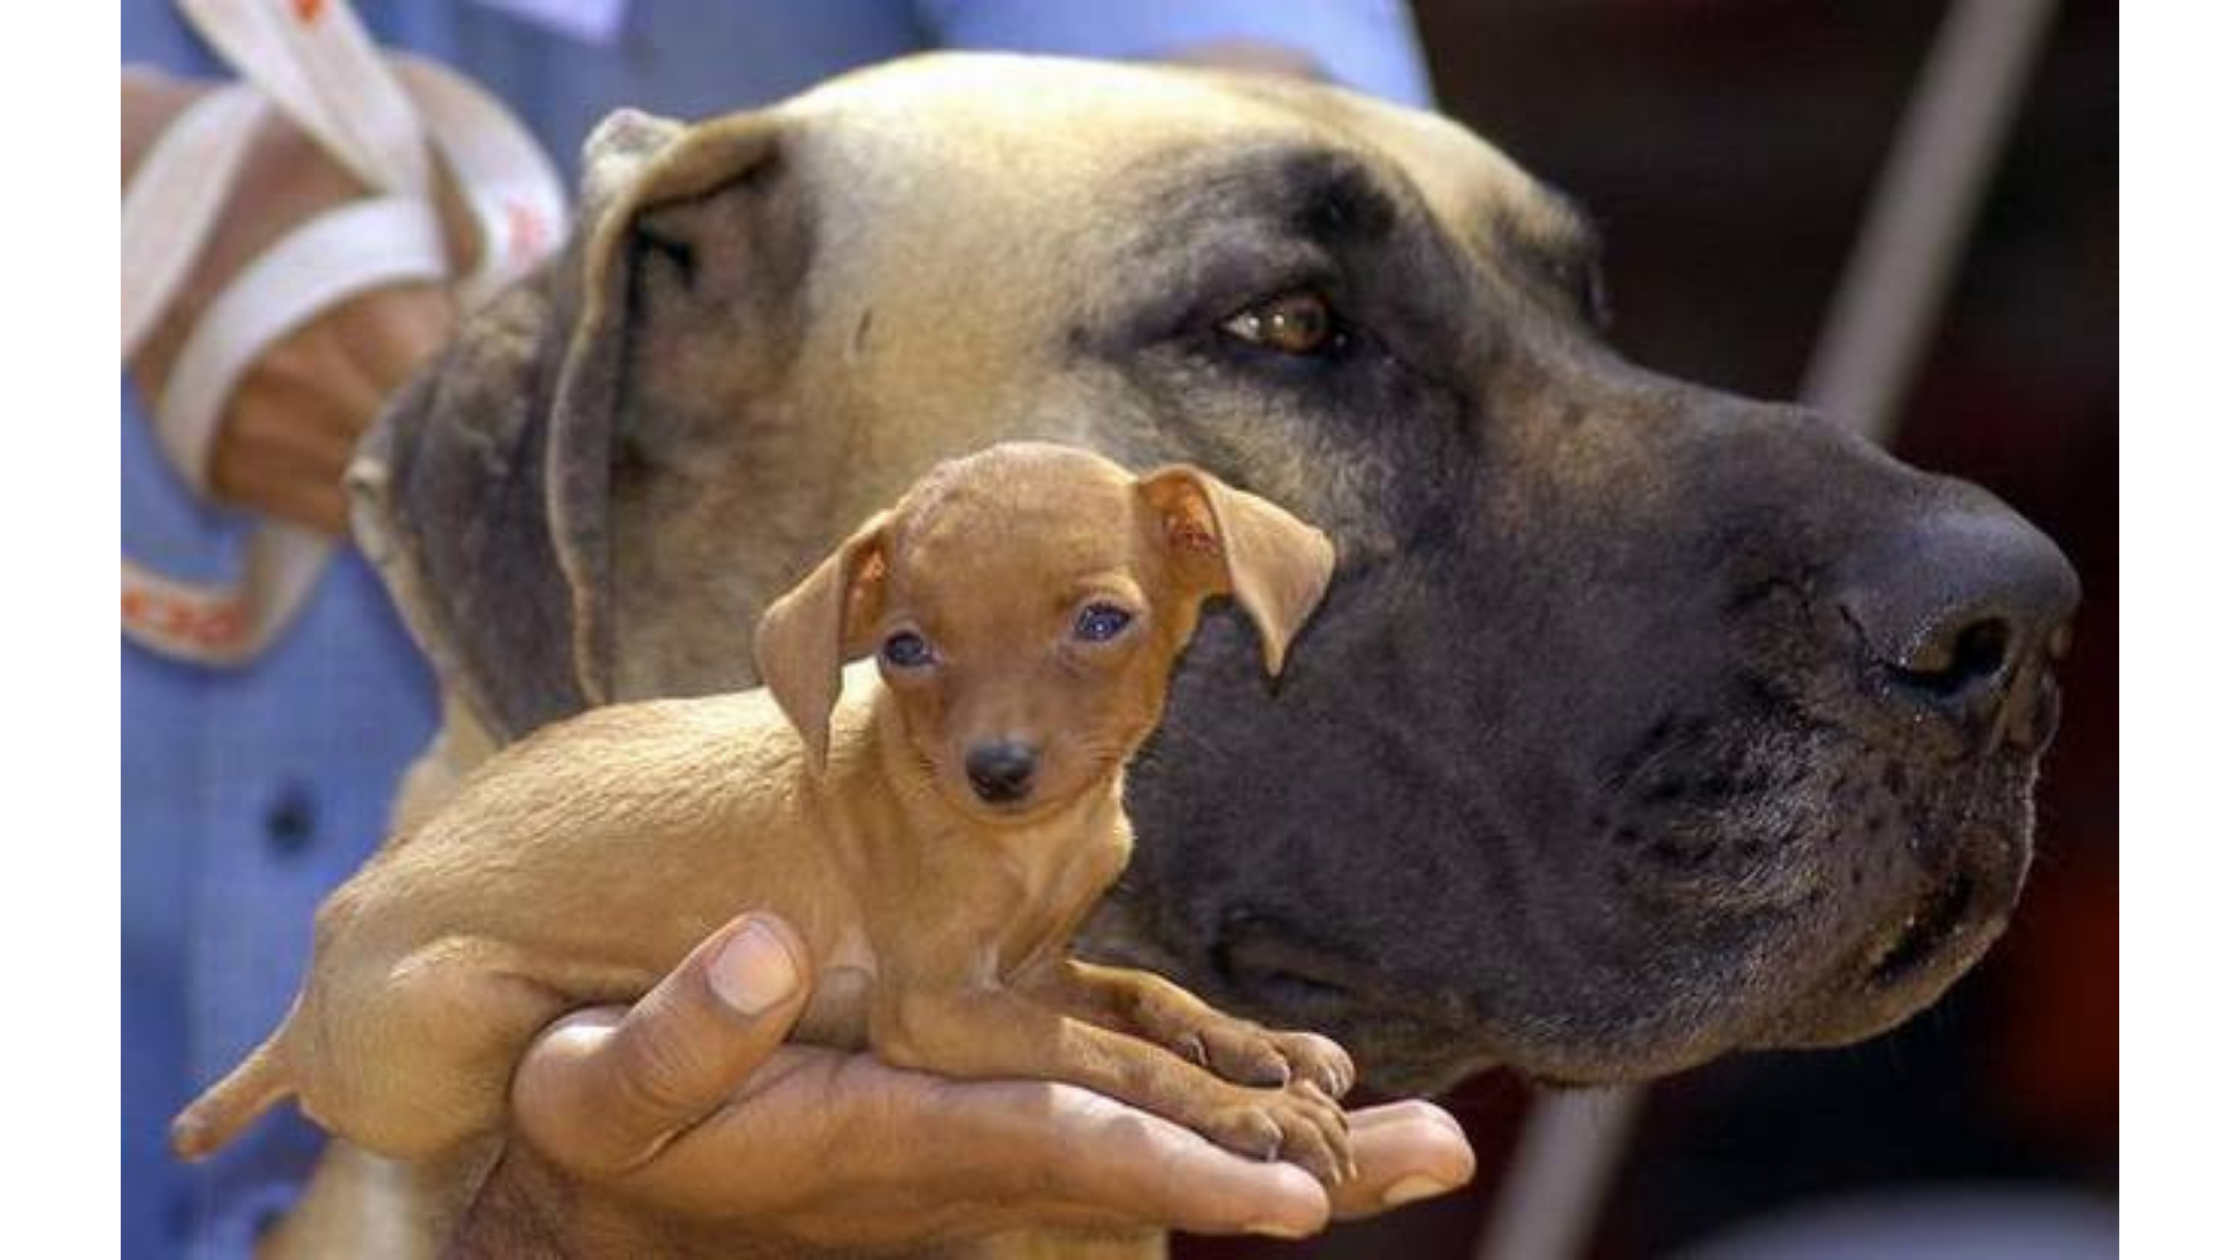 AWBI To Act Against Illegal dog breeding